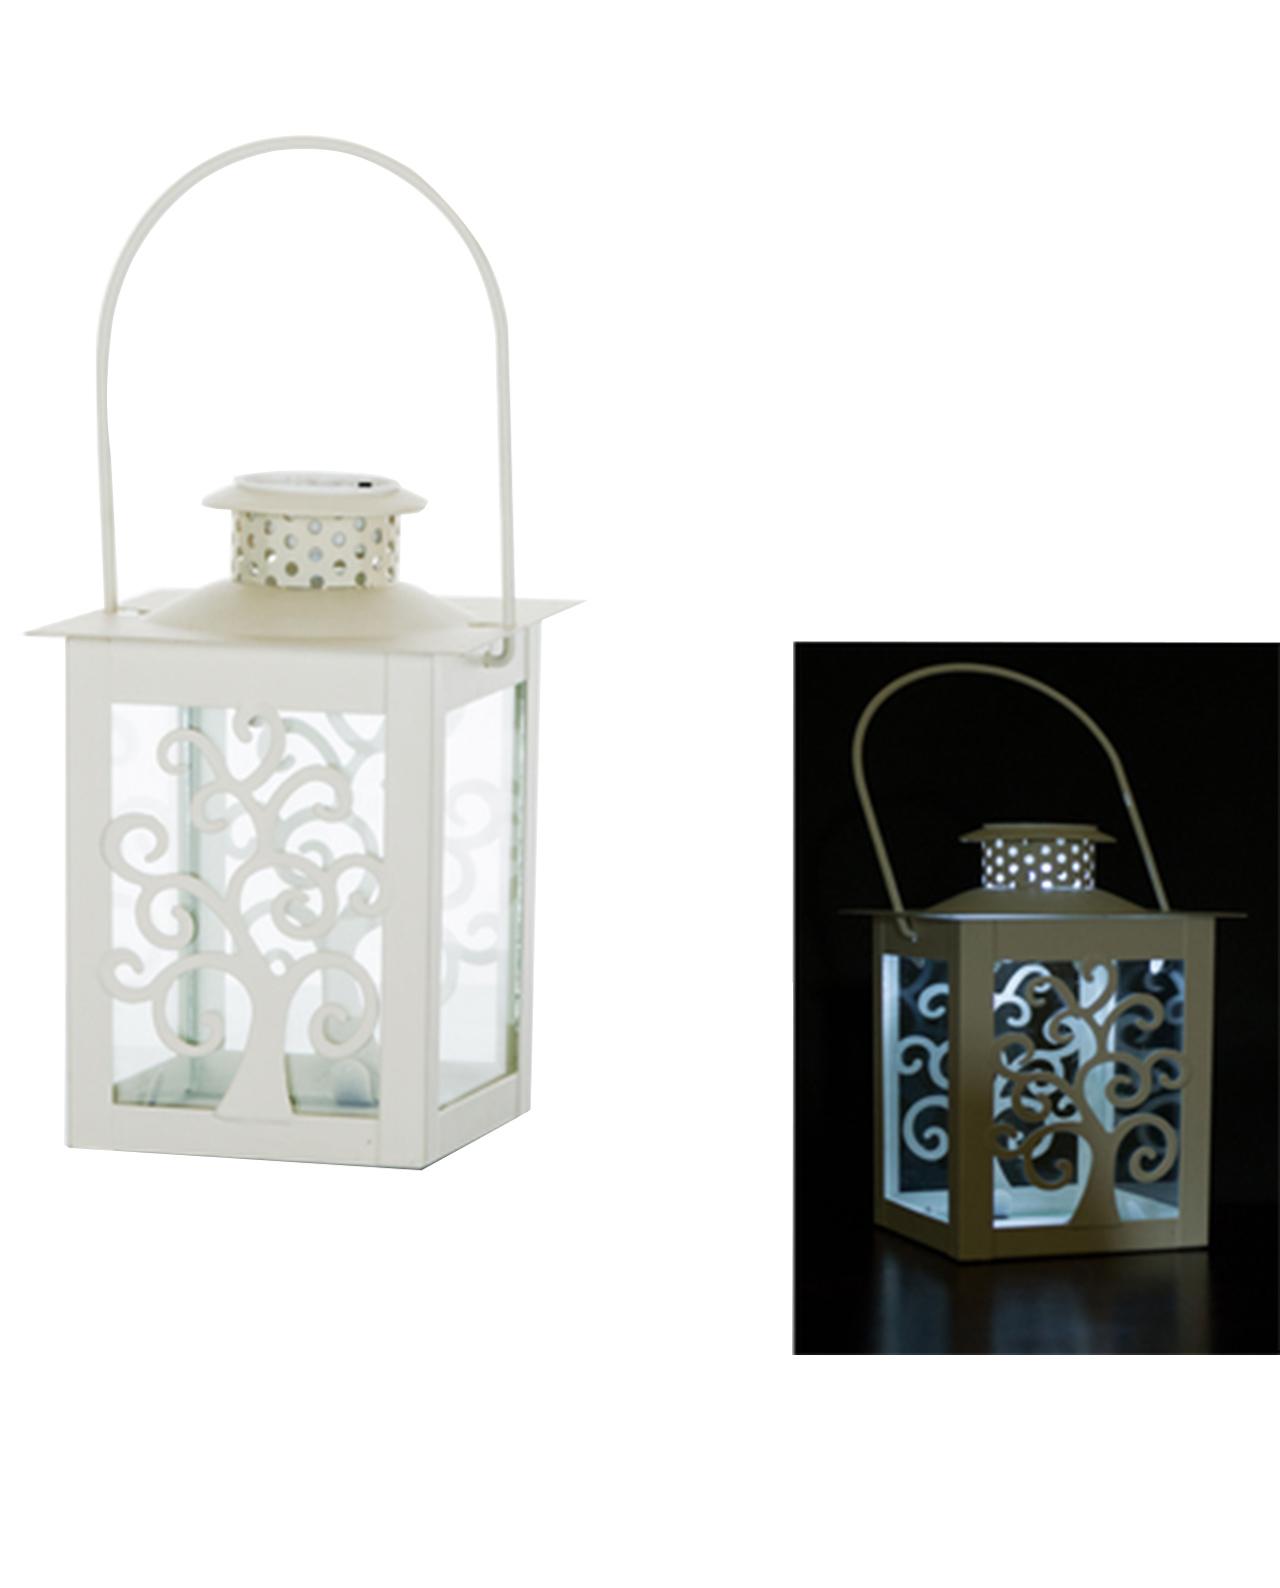 Lanterna Portacandela In Metallo Con Albero Della Vita